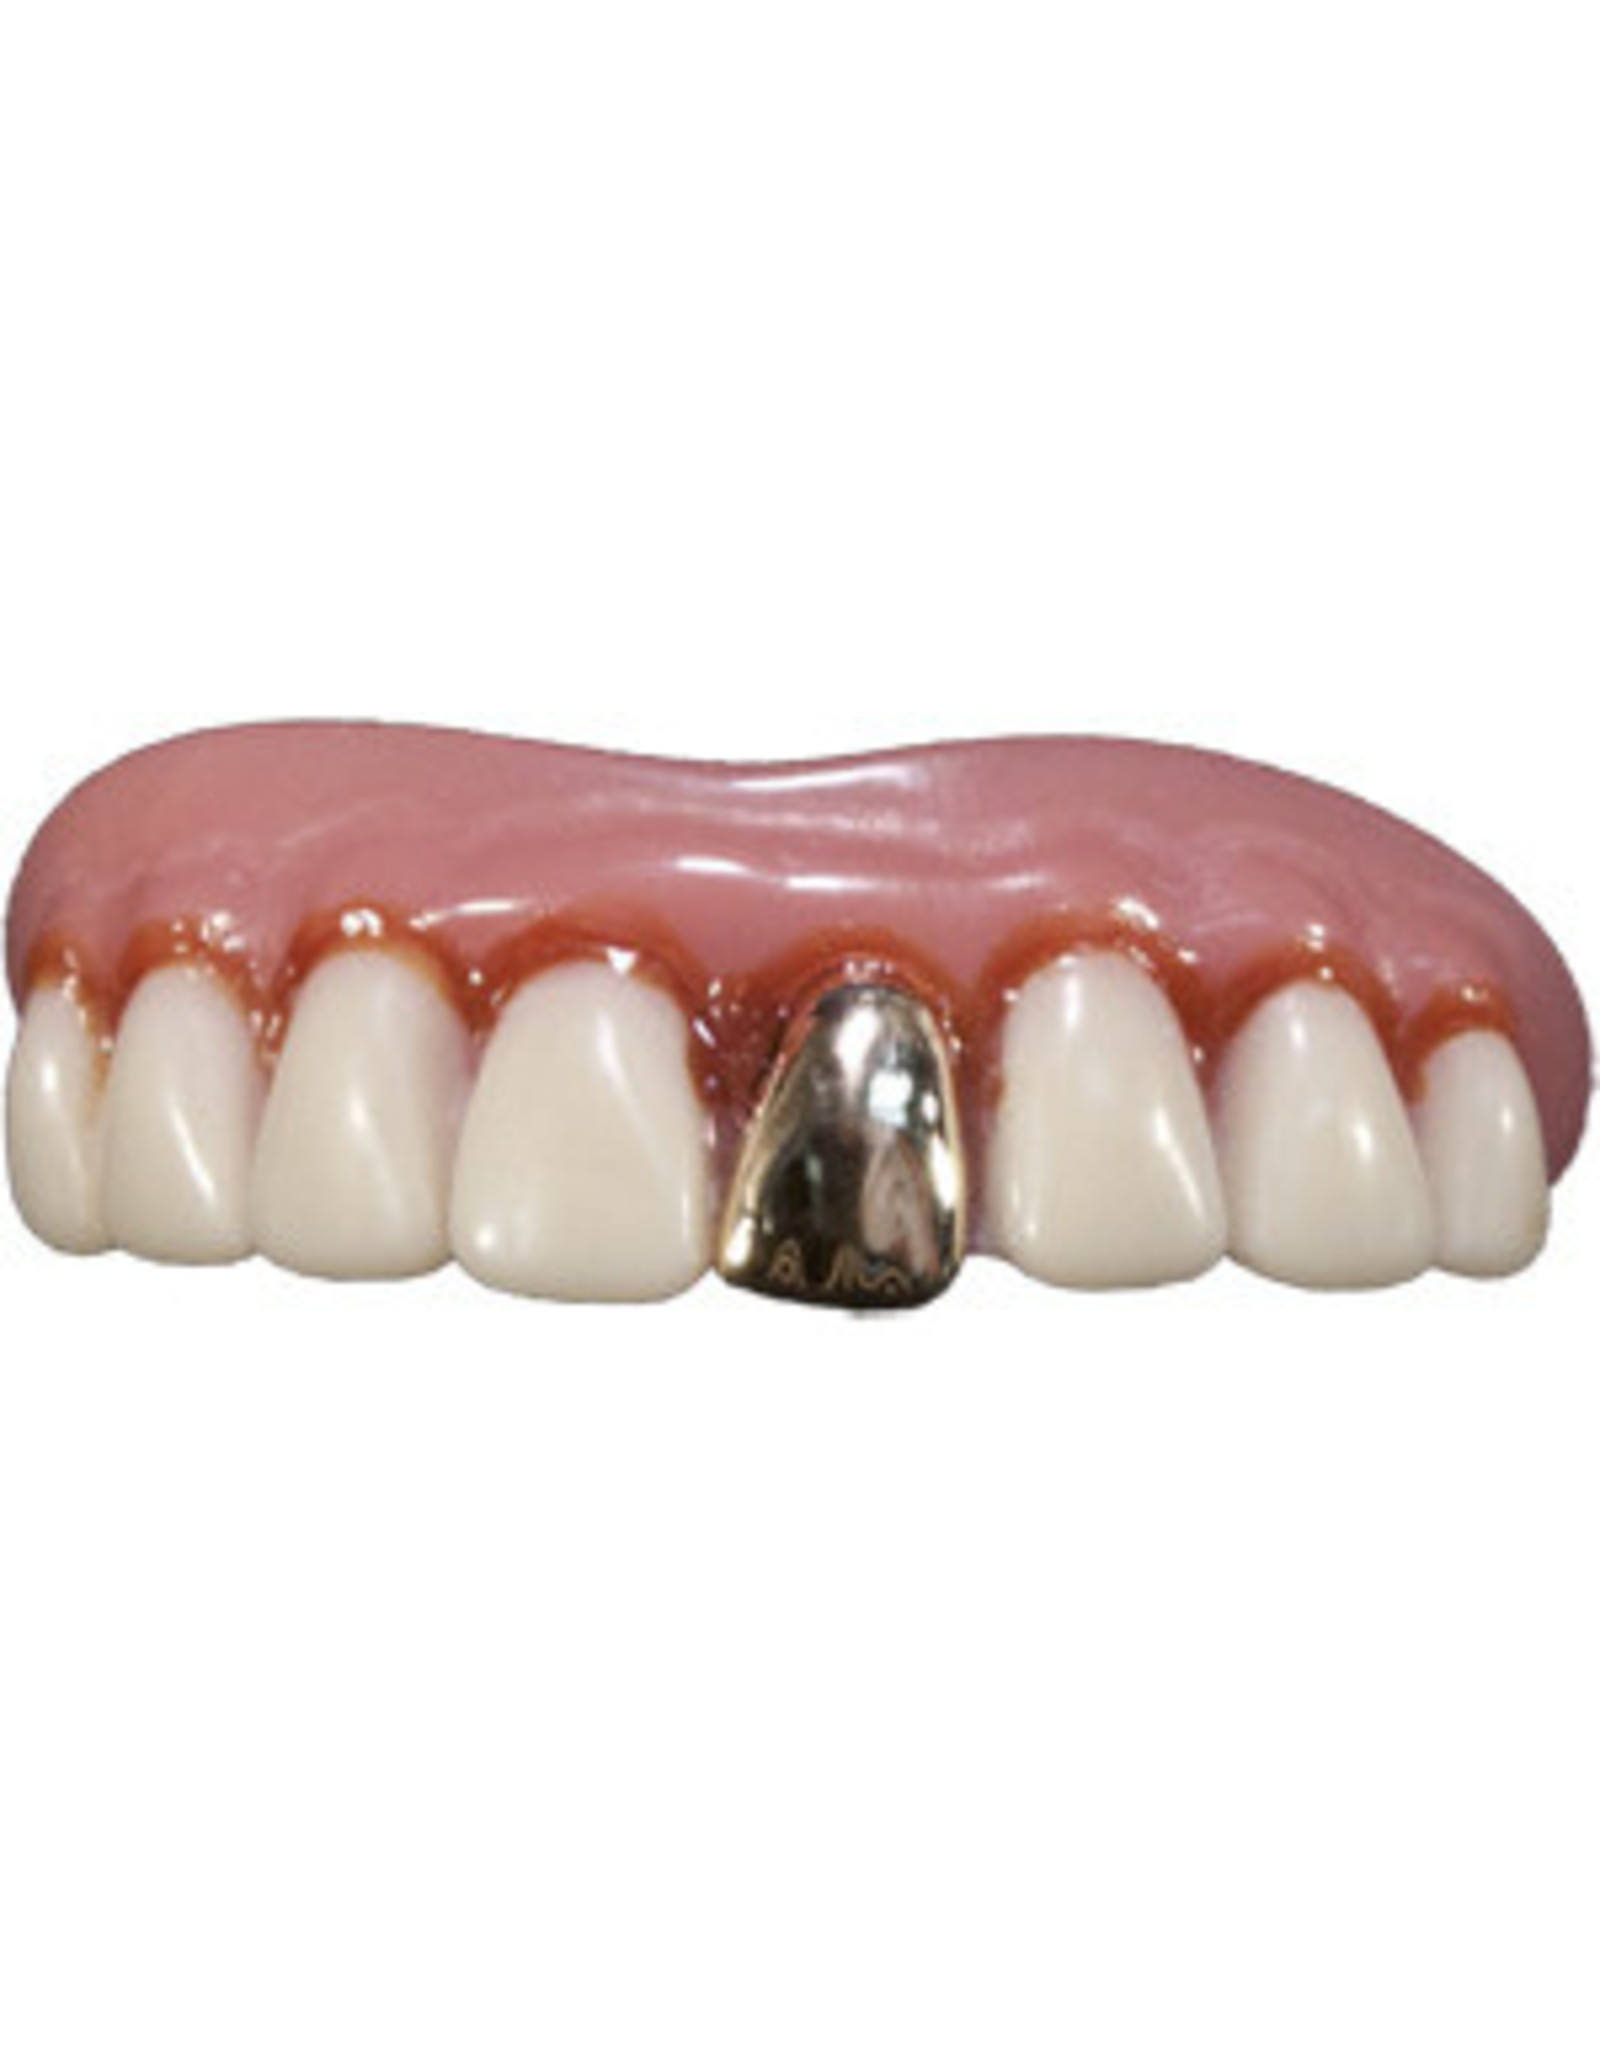 Billy-Bob Products Billy-Bob Teeth Bling-Bling